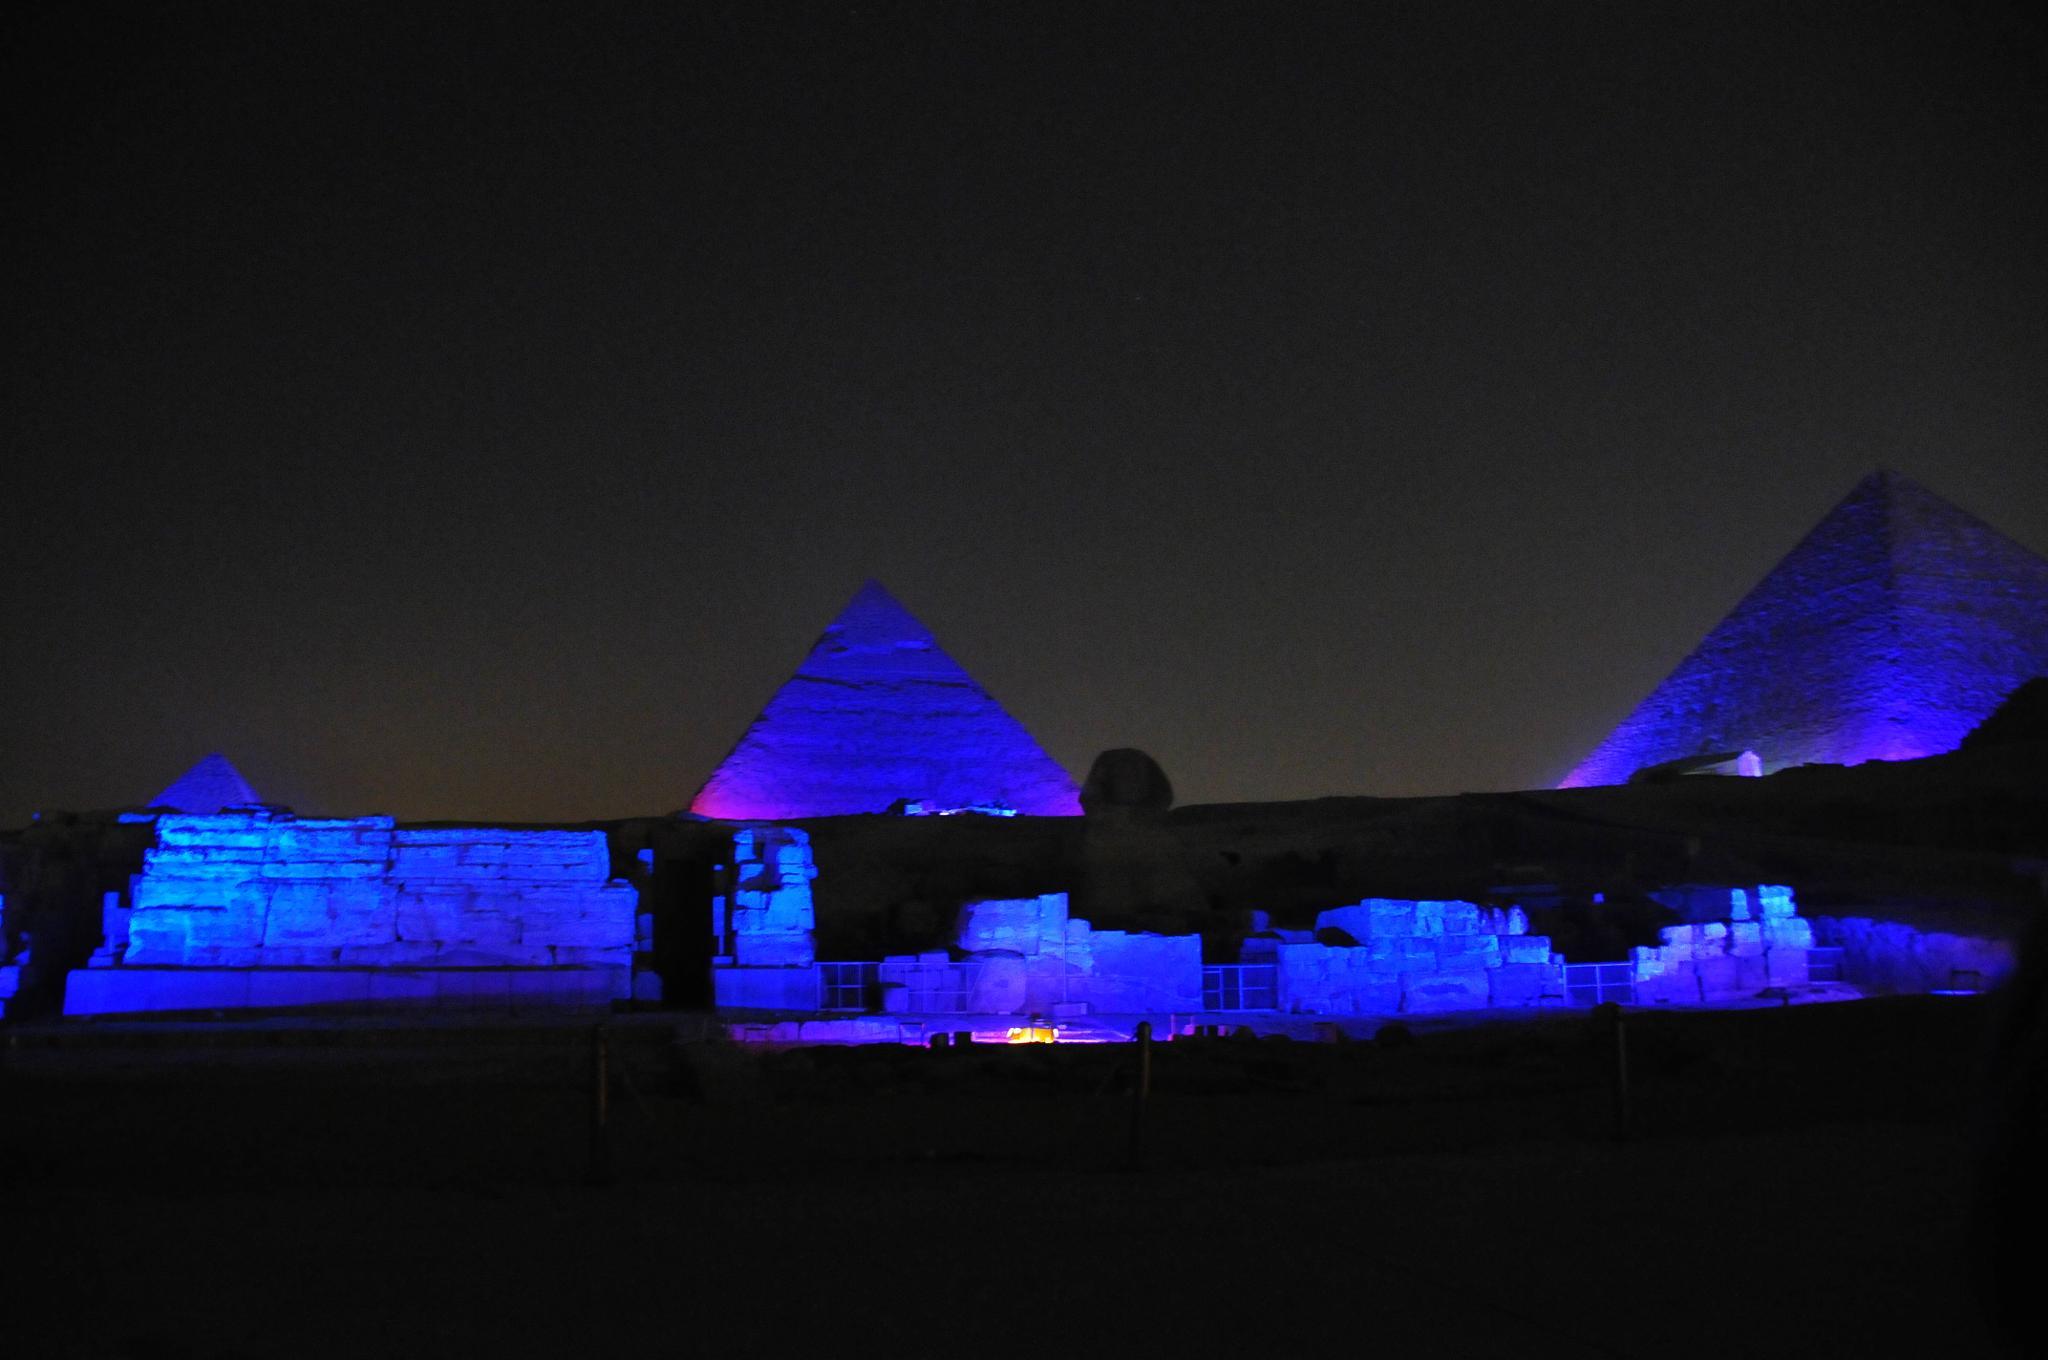 Pyramids at Giza Light Show by Serge Kay